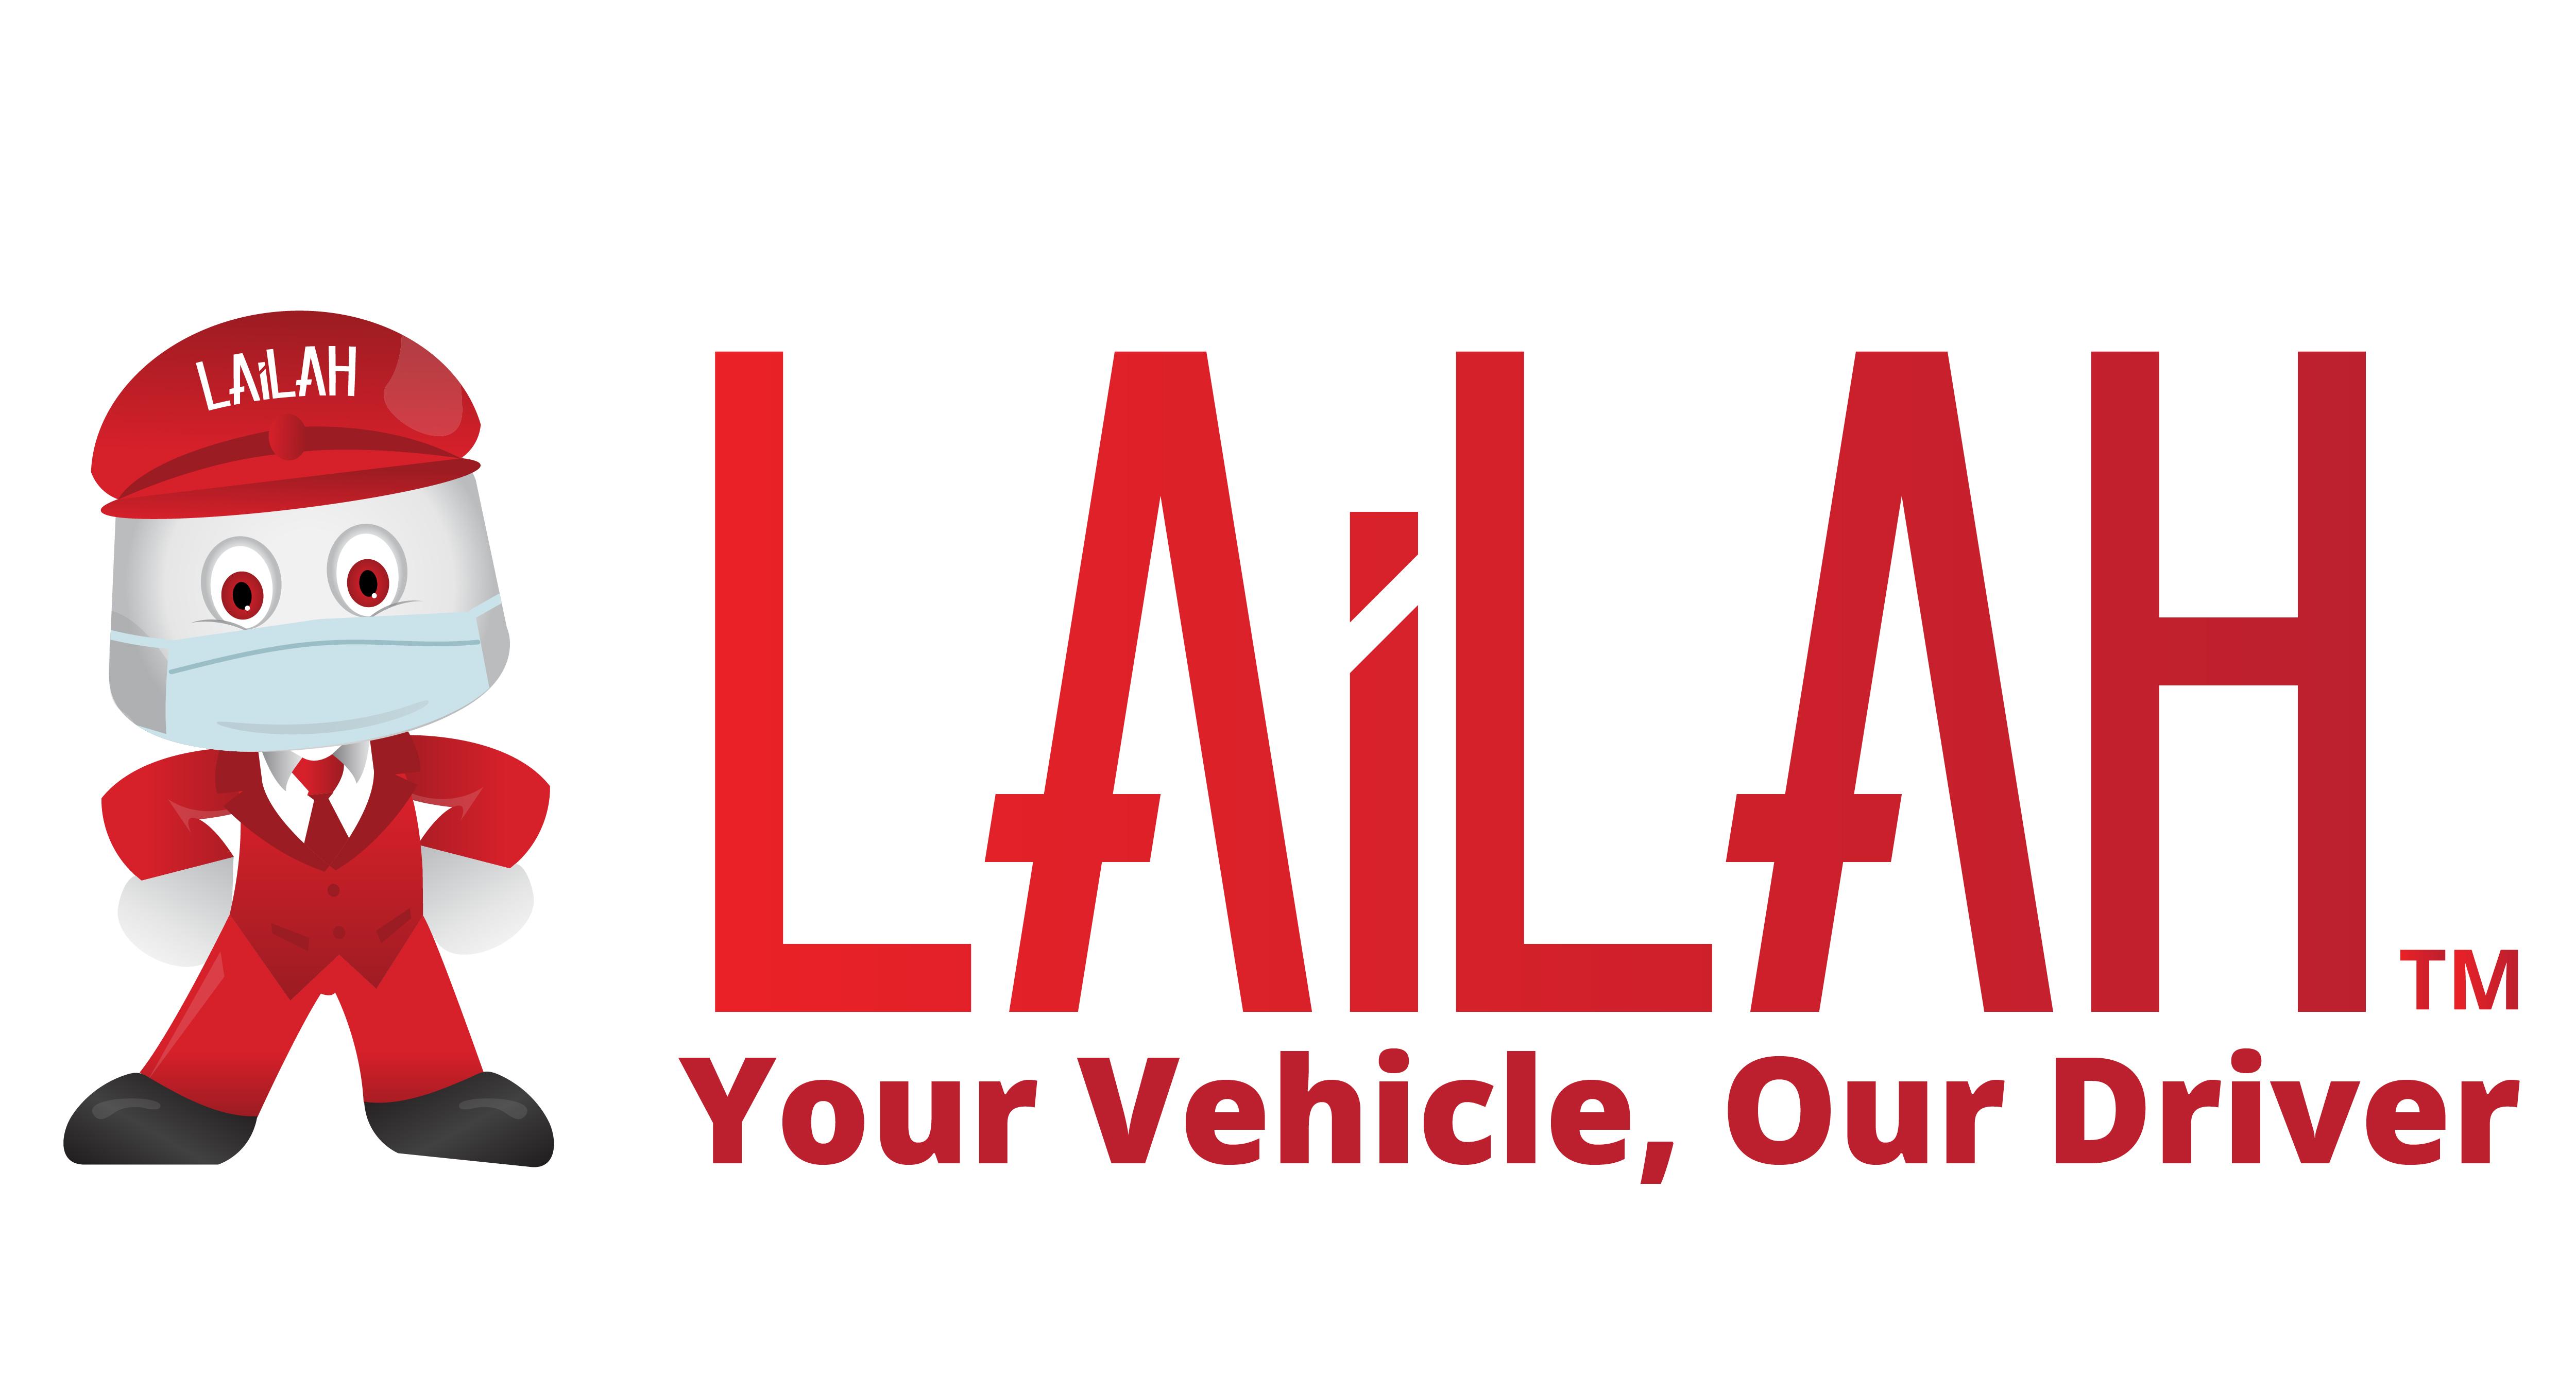 LaiLah